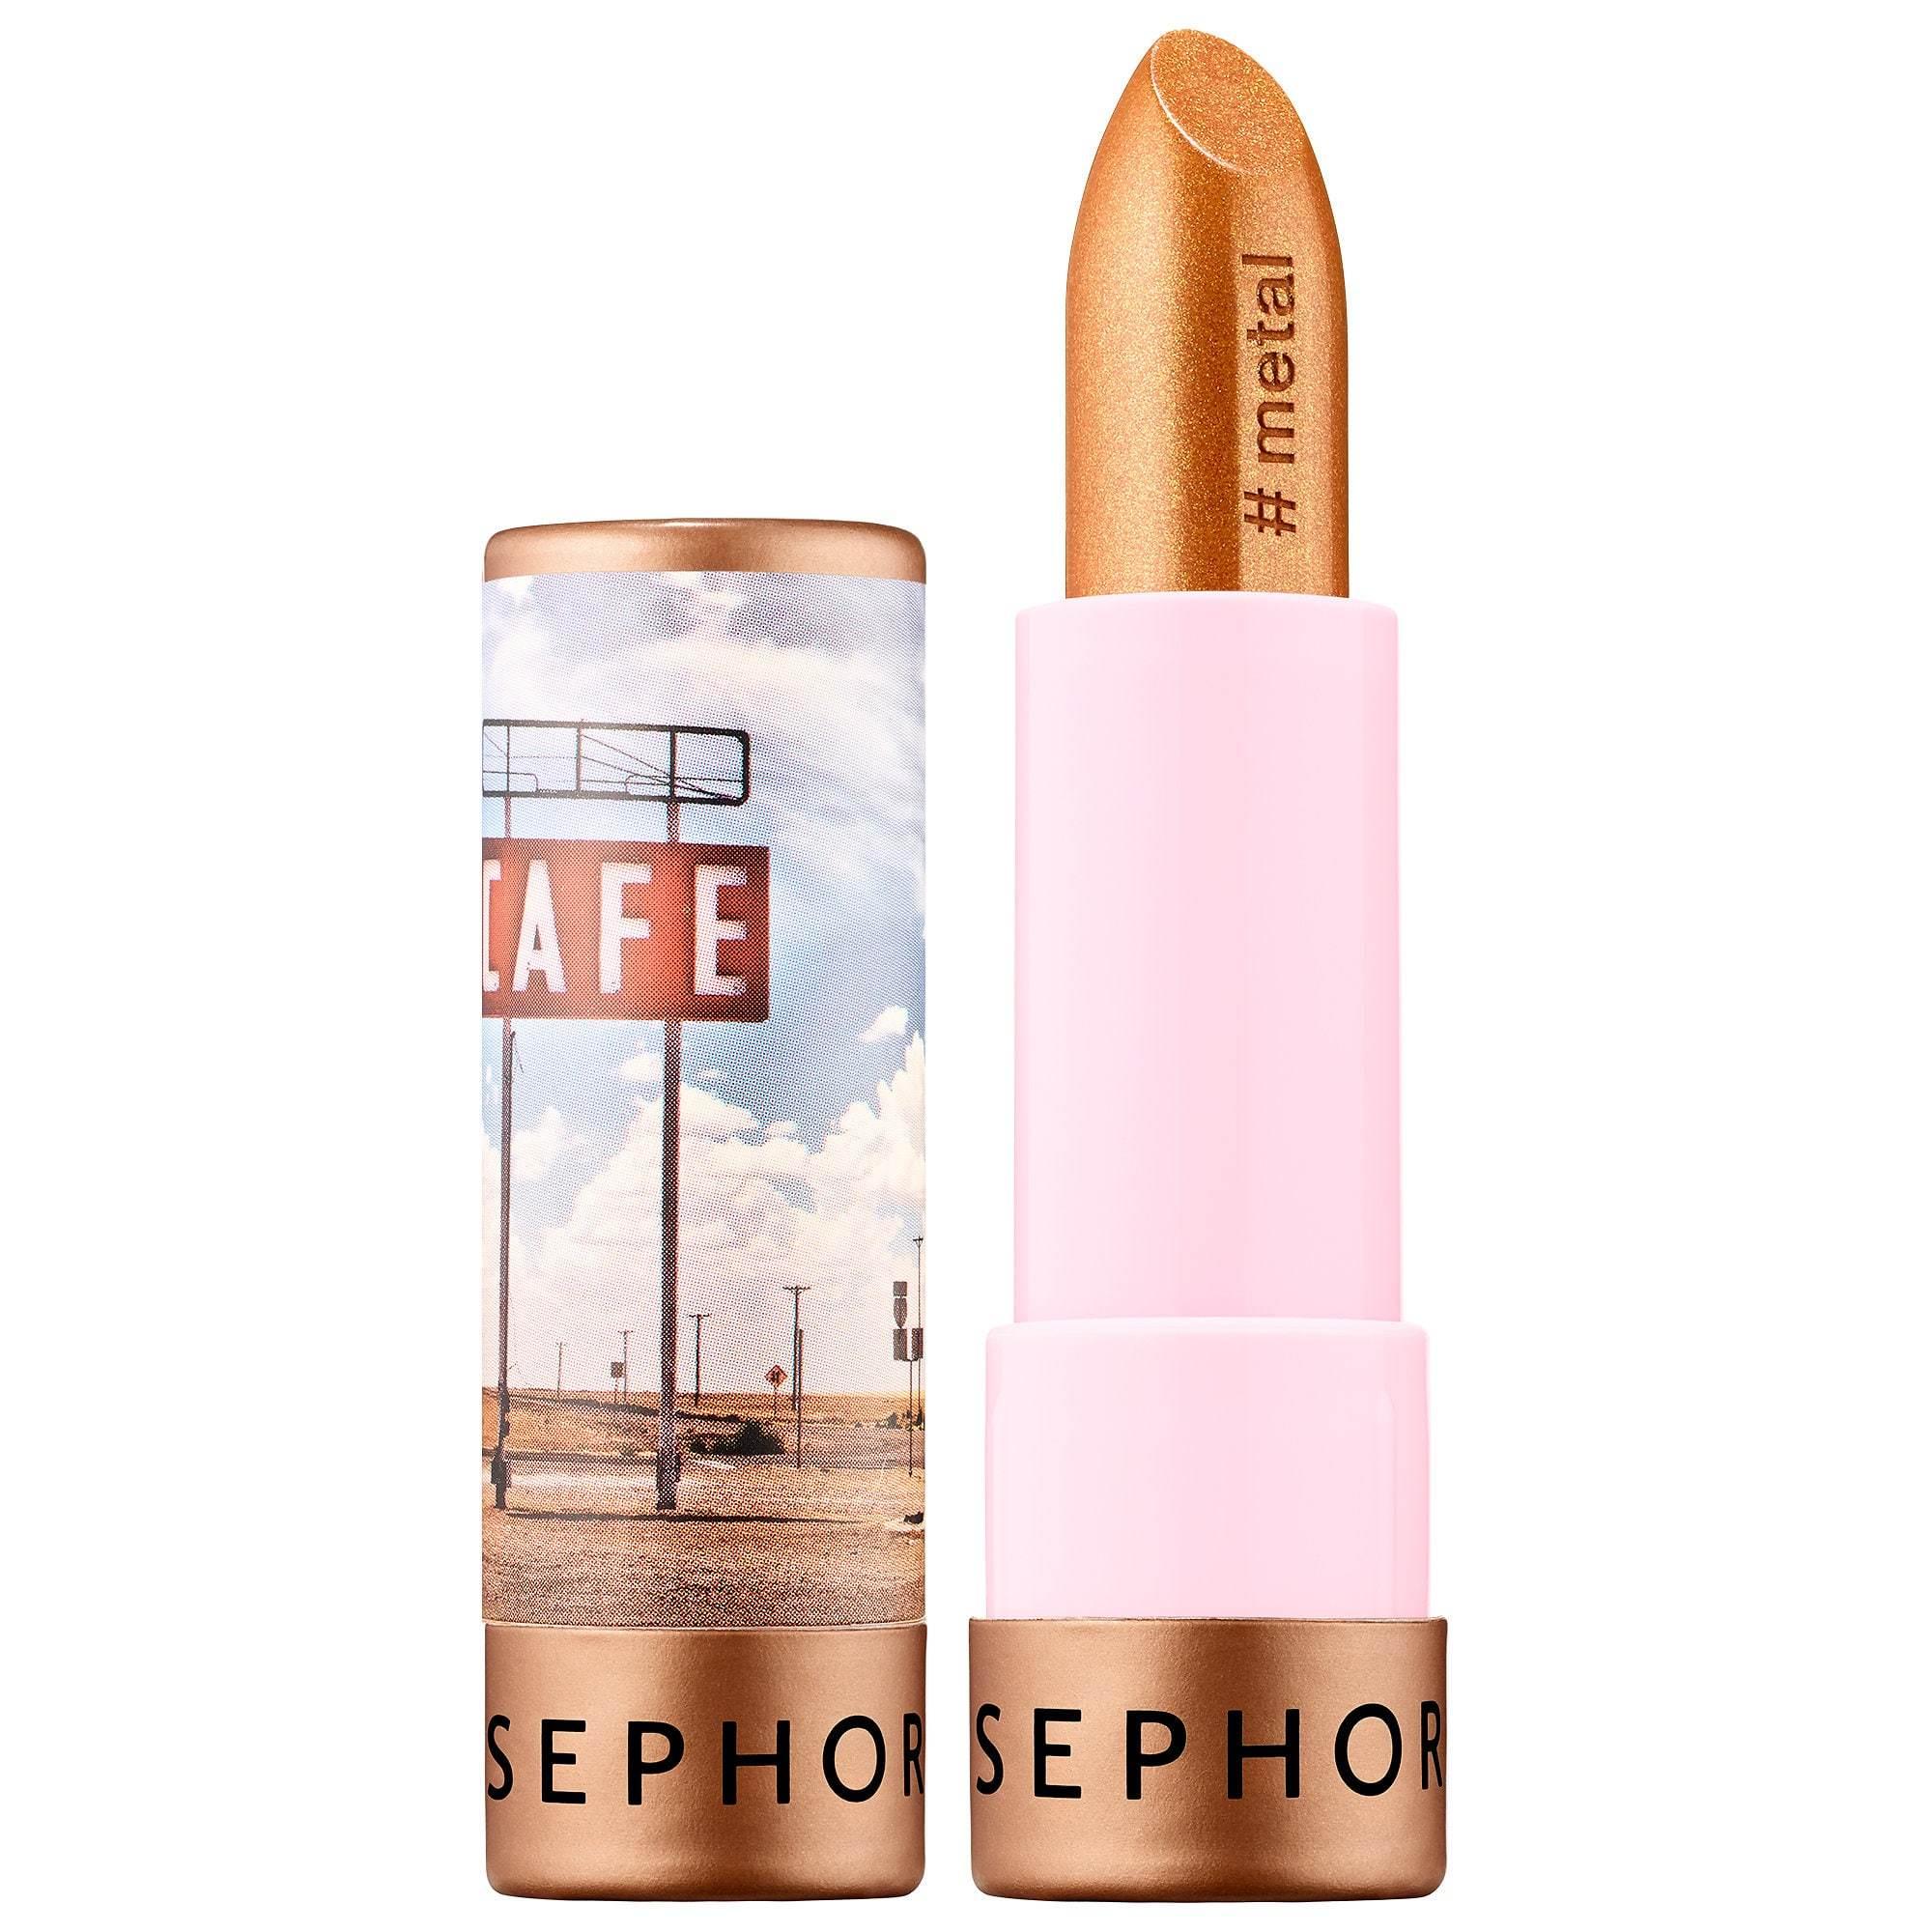 Sephora #Lipstories Lipstick No Cell Service 42